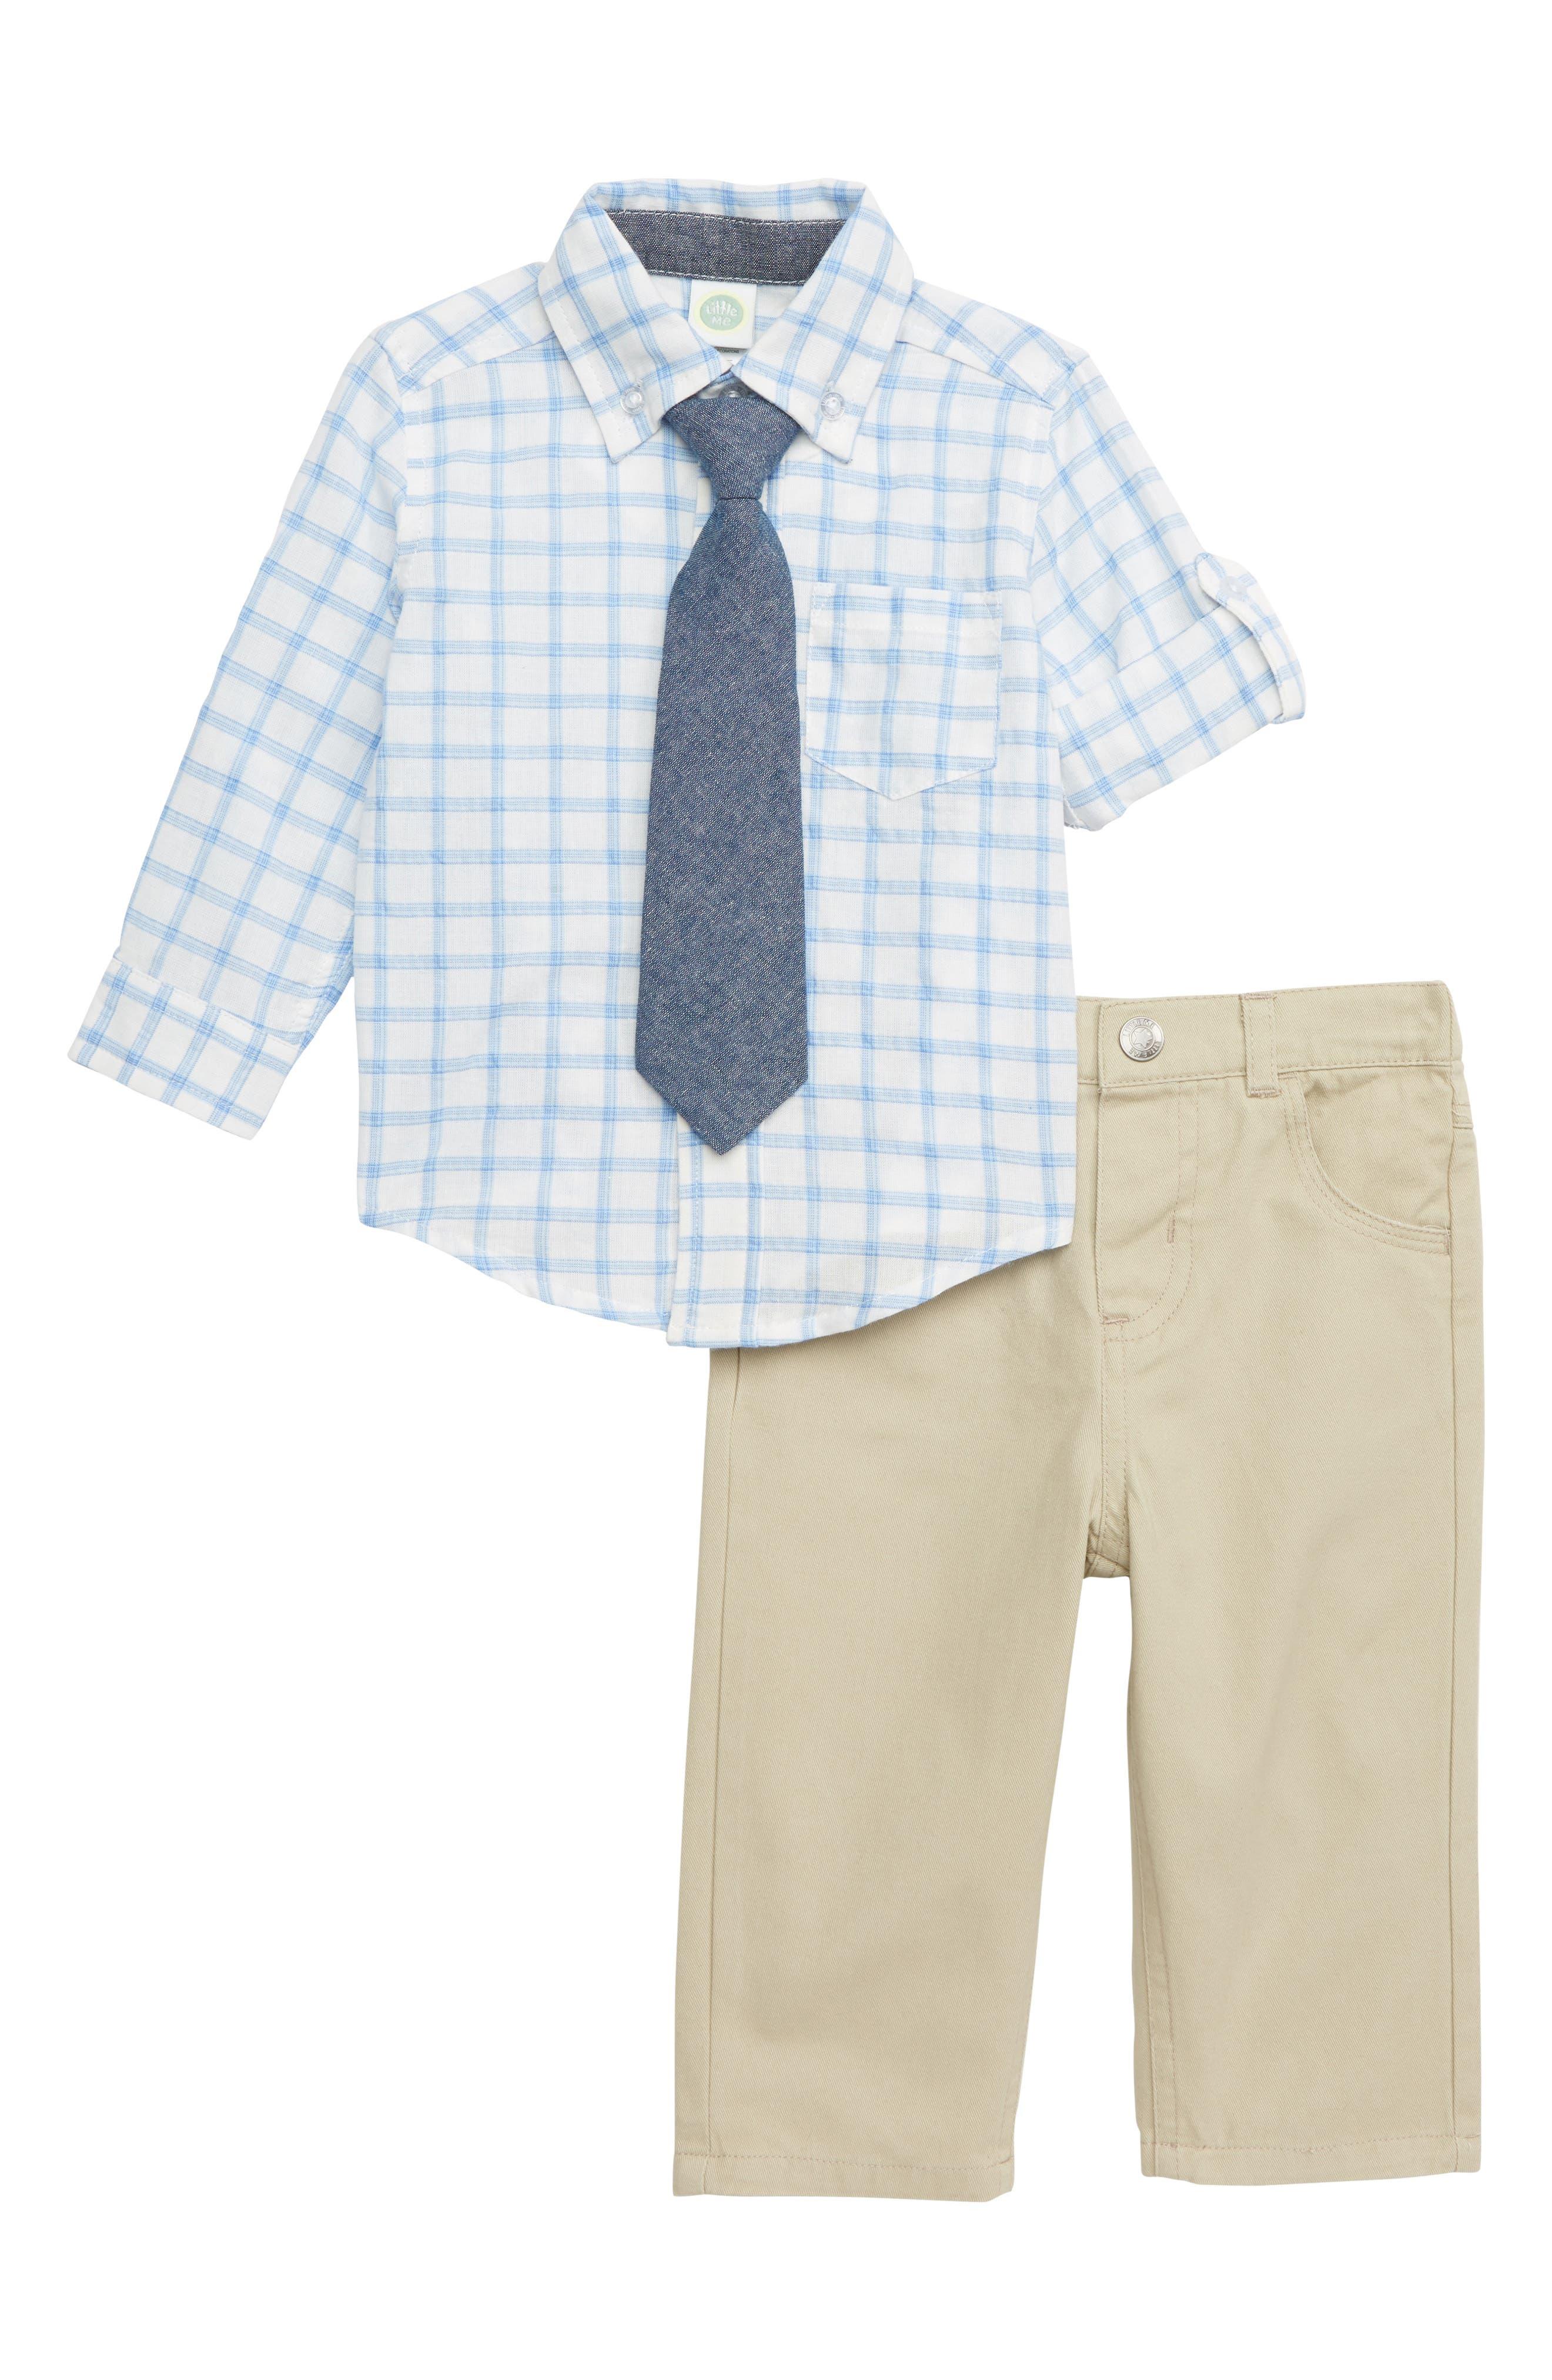 LITTLE ME Tattersall Plaid Shirt, Pants & Tie Set, Main, color, 250